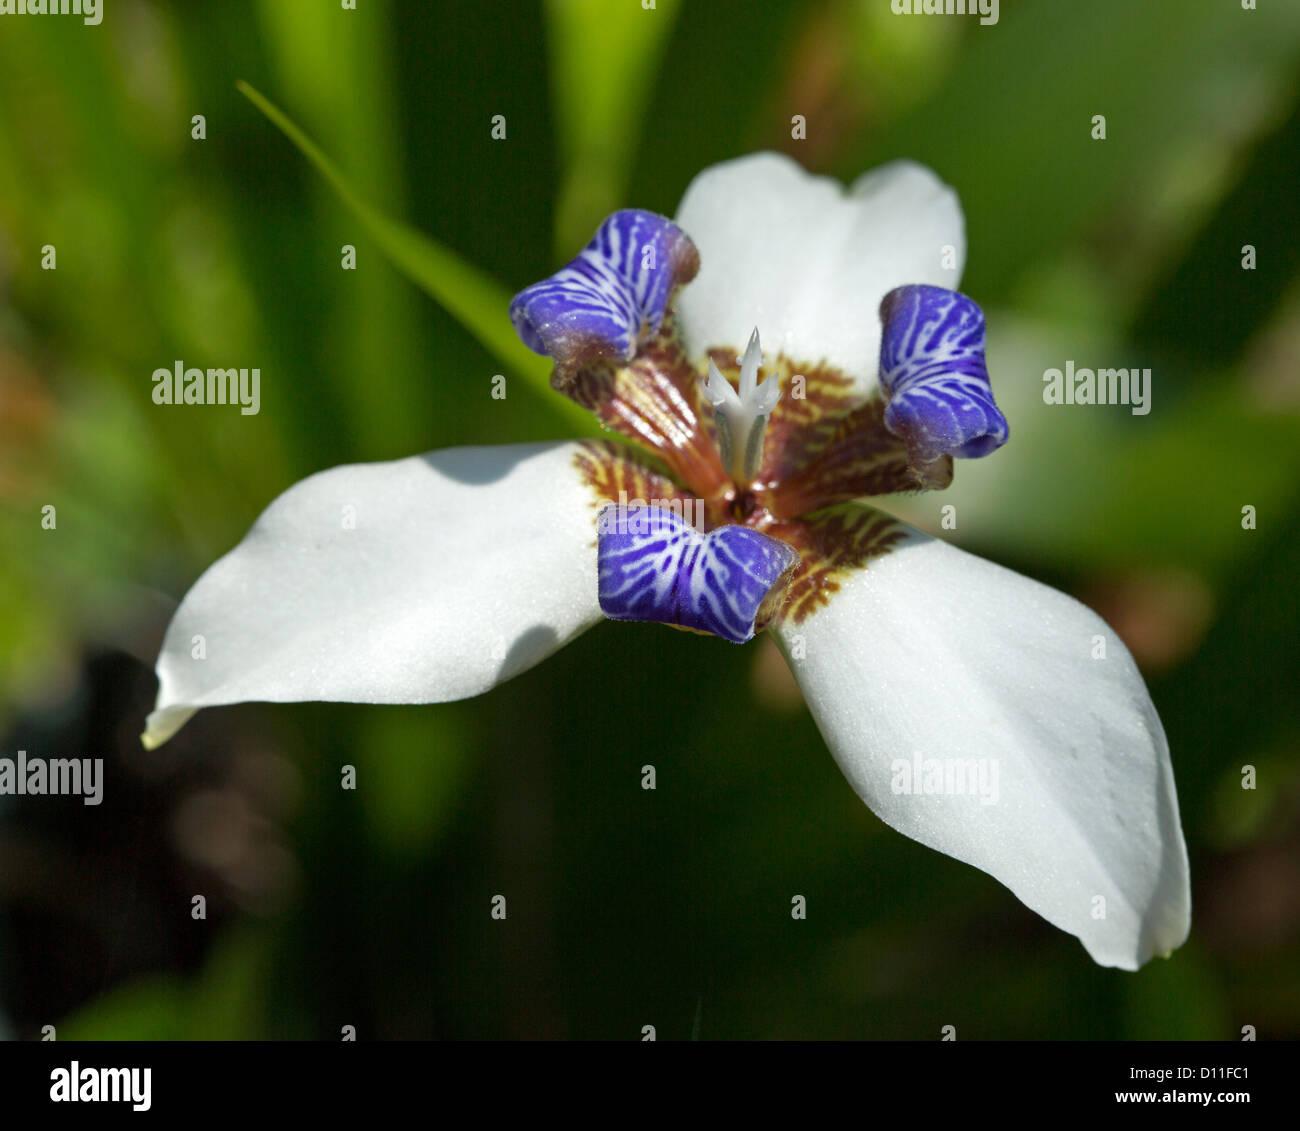 Walking iris stock photos walking iris stock images alamy neomarica gracilis walking iris blue and white flower of perennial garden plant izmirmasajfo